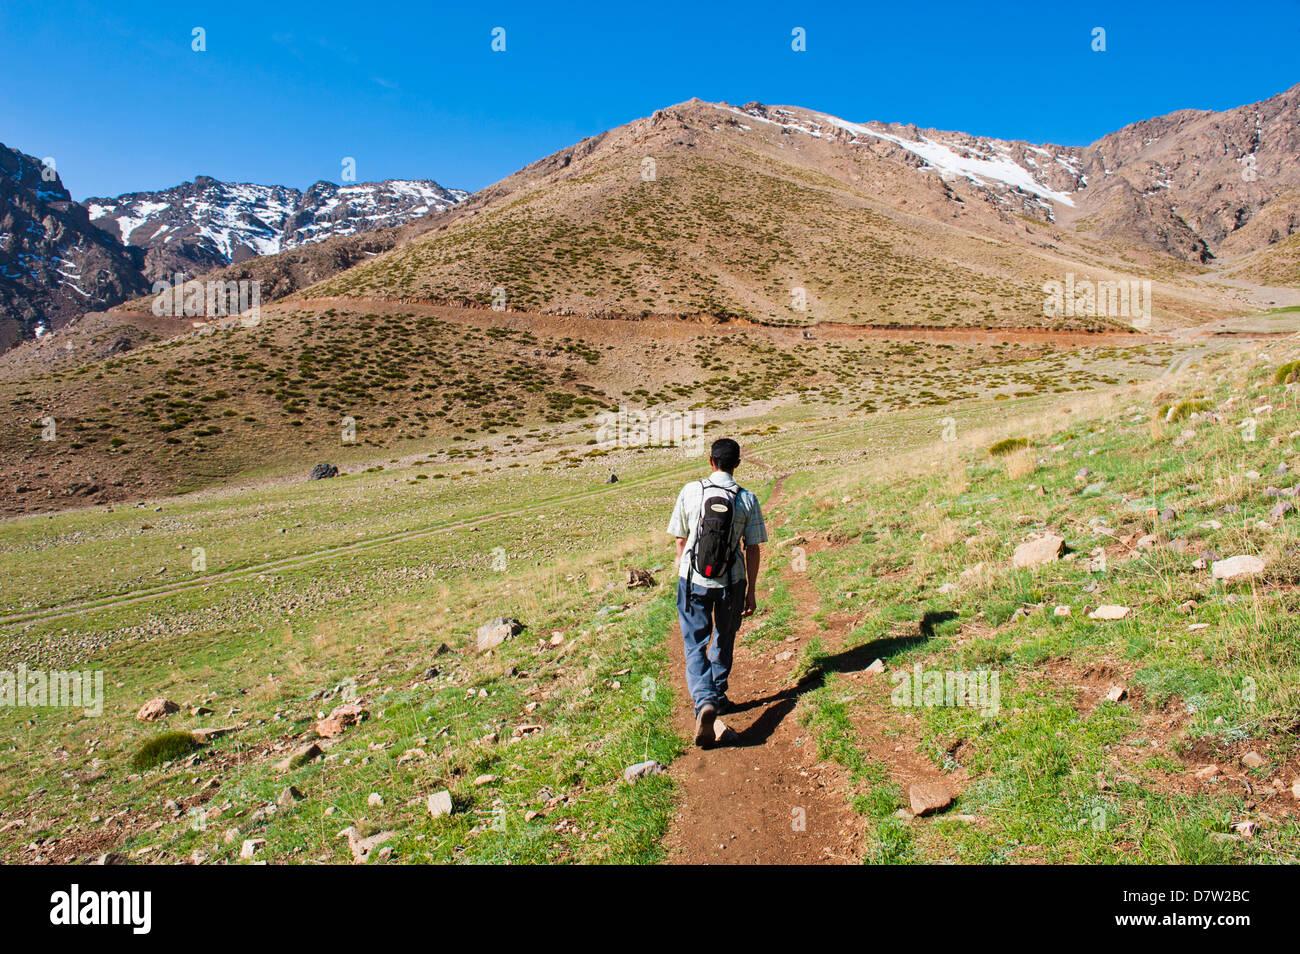 Trekking Tour-Führer zu Fuß in Oukaimeden Skigebiet, im Sommer, Atlasgebirge, Marokko, Nordafrika Stockbild